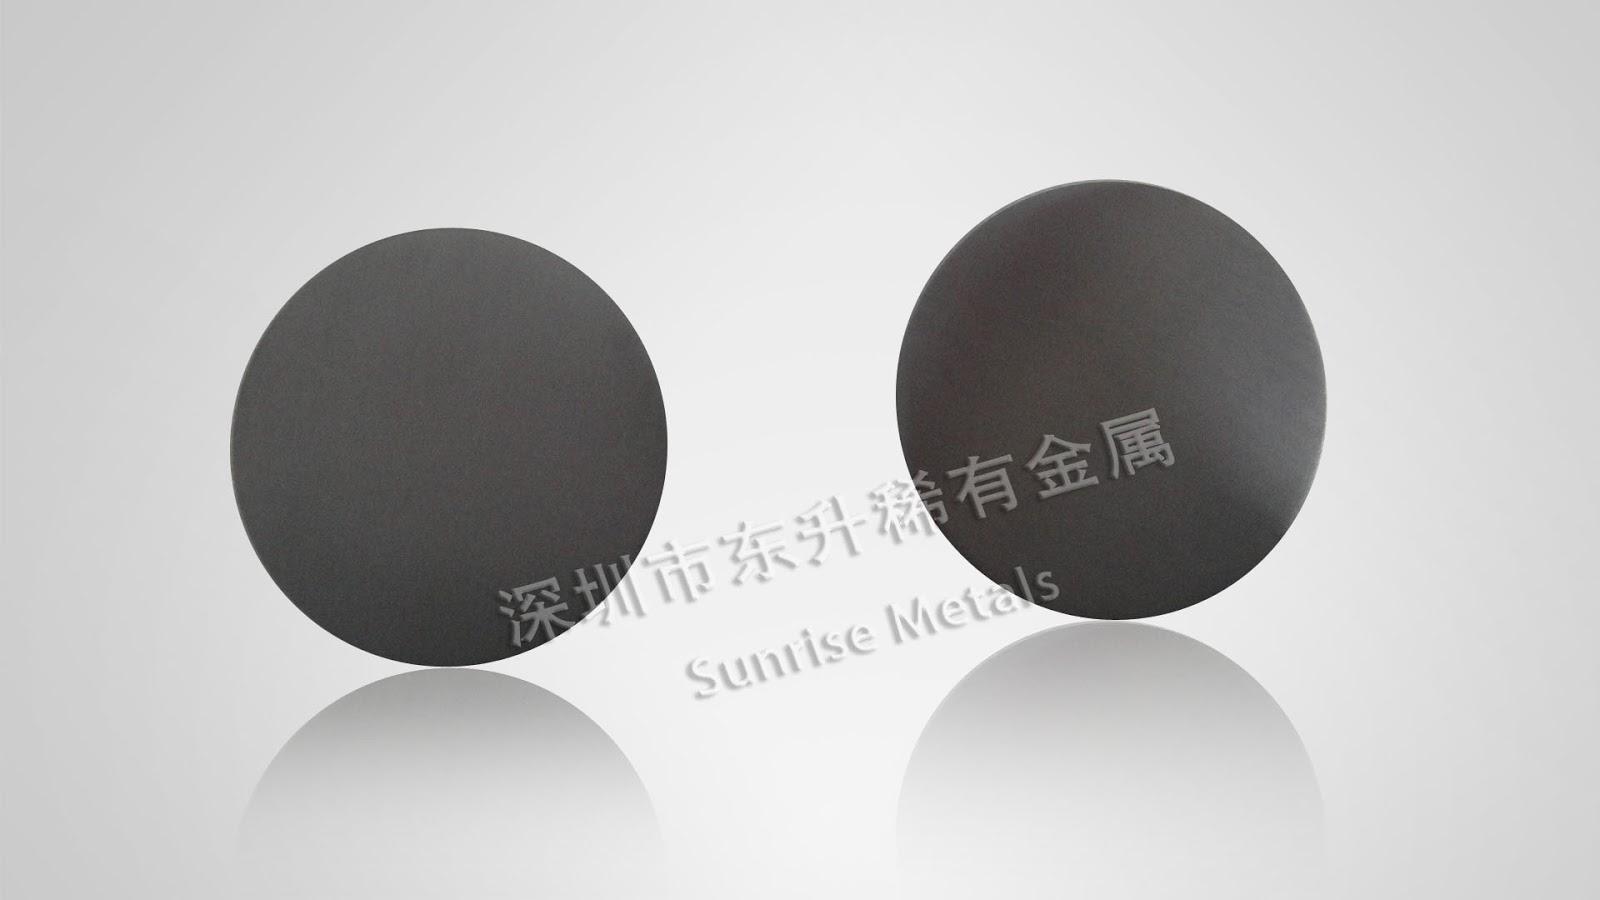 Shenzhen Sunrise Metal Industry Co Ltd Mail: Niobium C103 Supplier-Shenzhen Sunrise Metal Industry Co